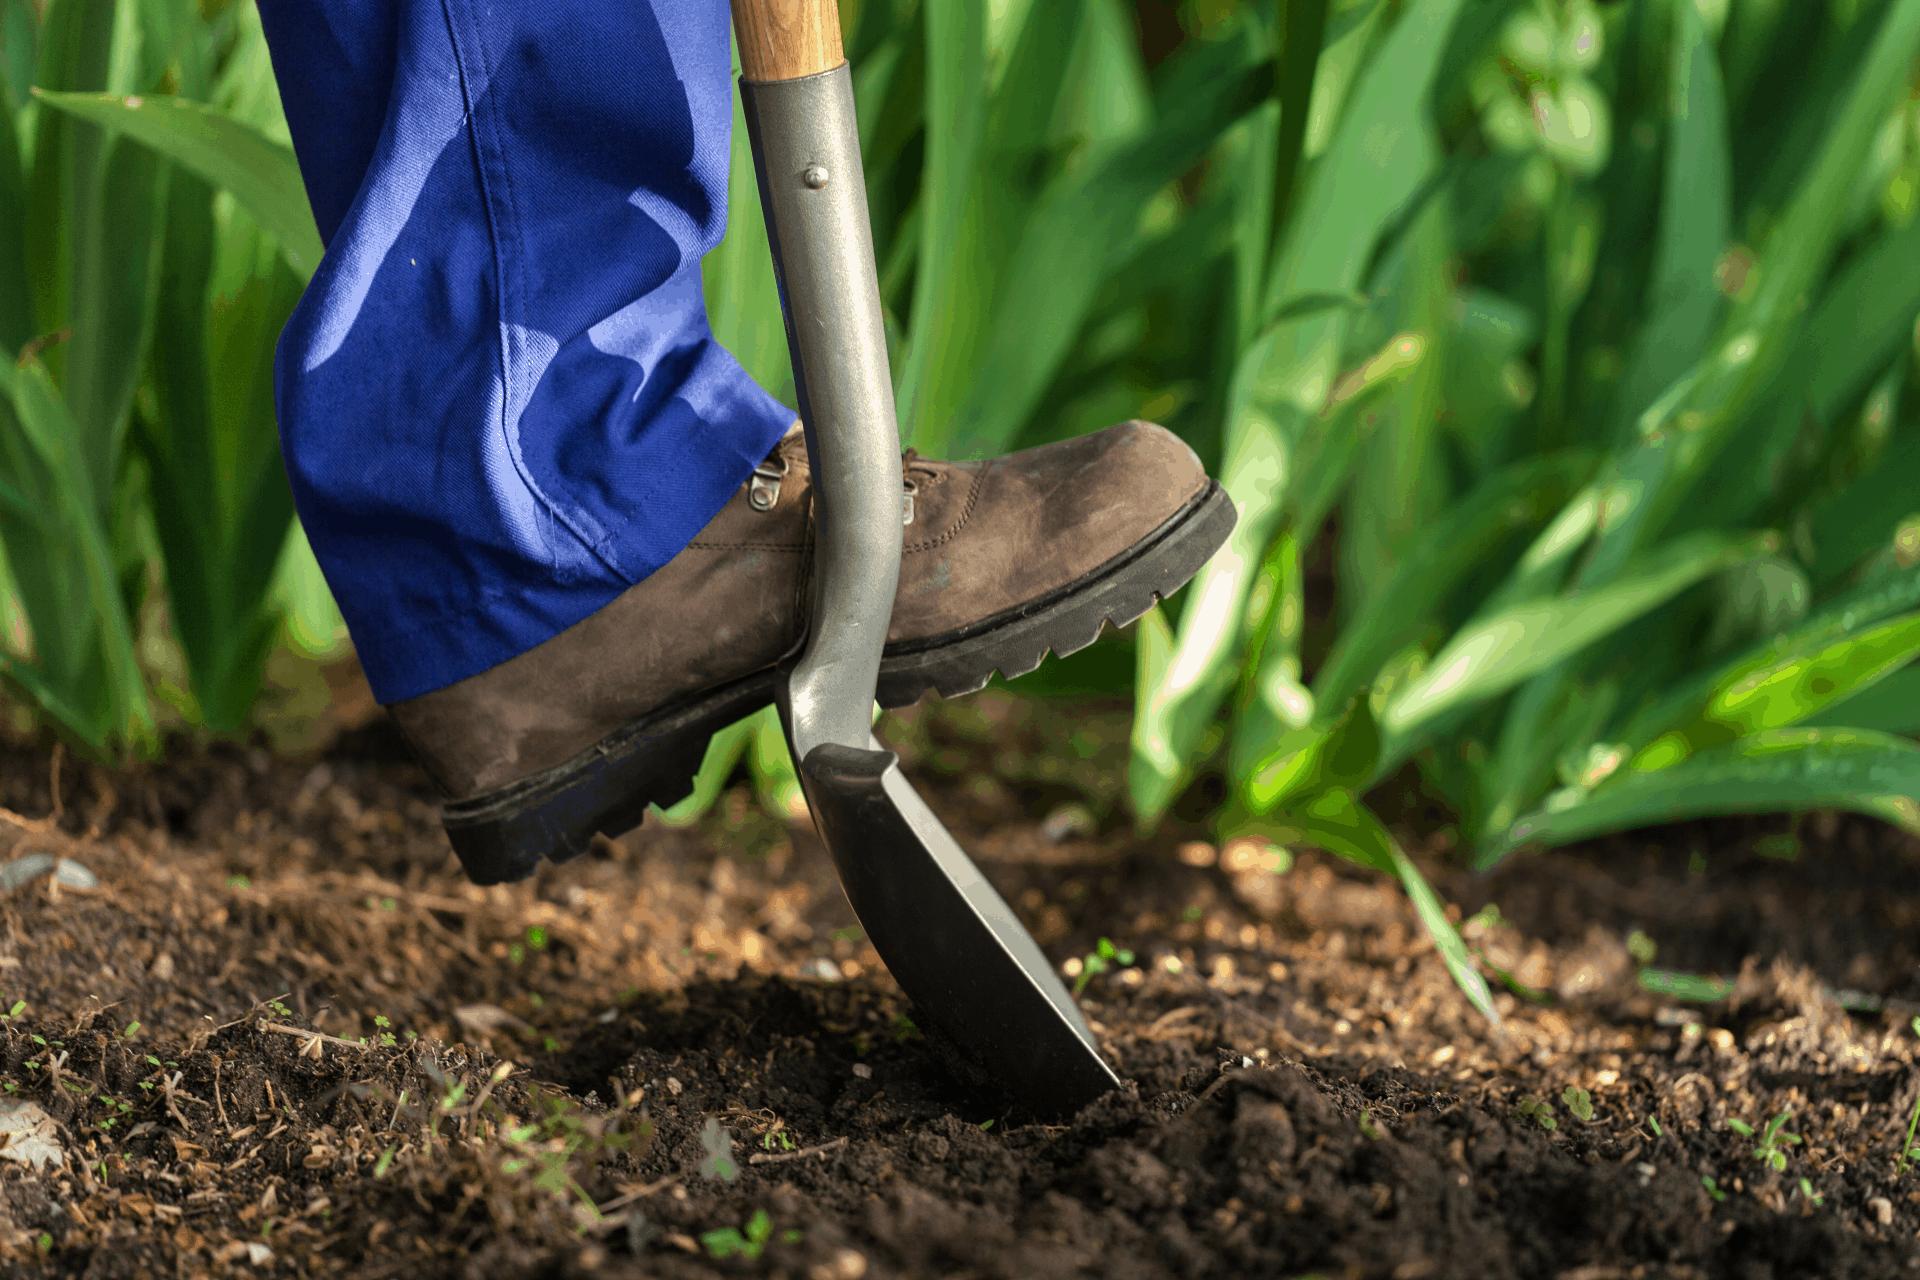 Rengjøre hageredskap